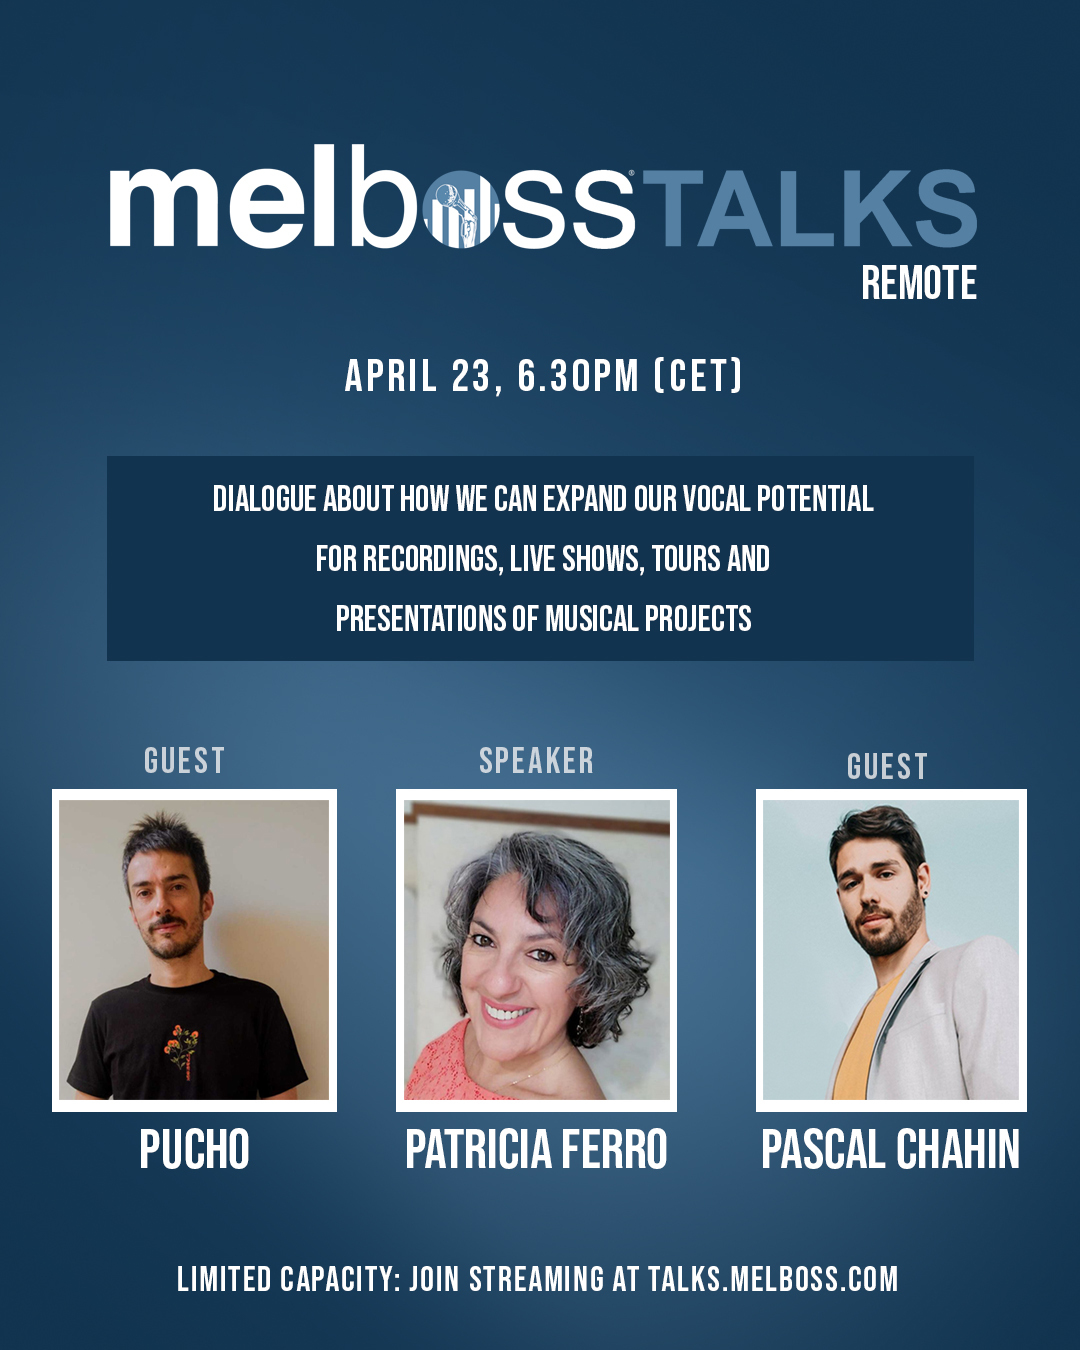 Melboss Talks in streaming